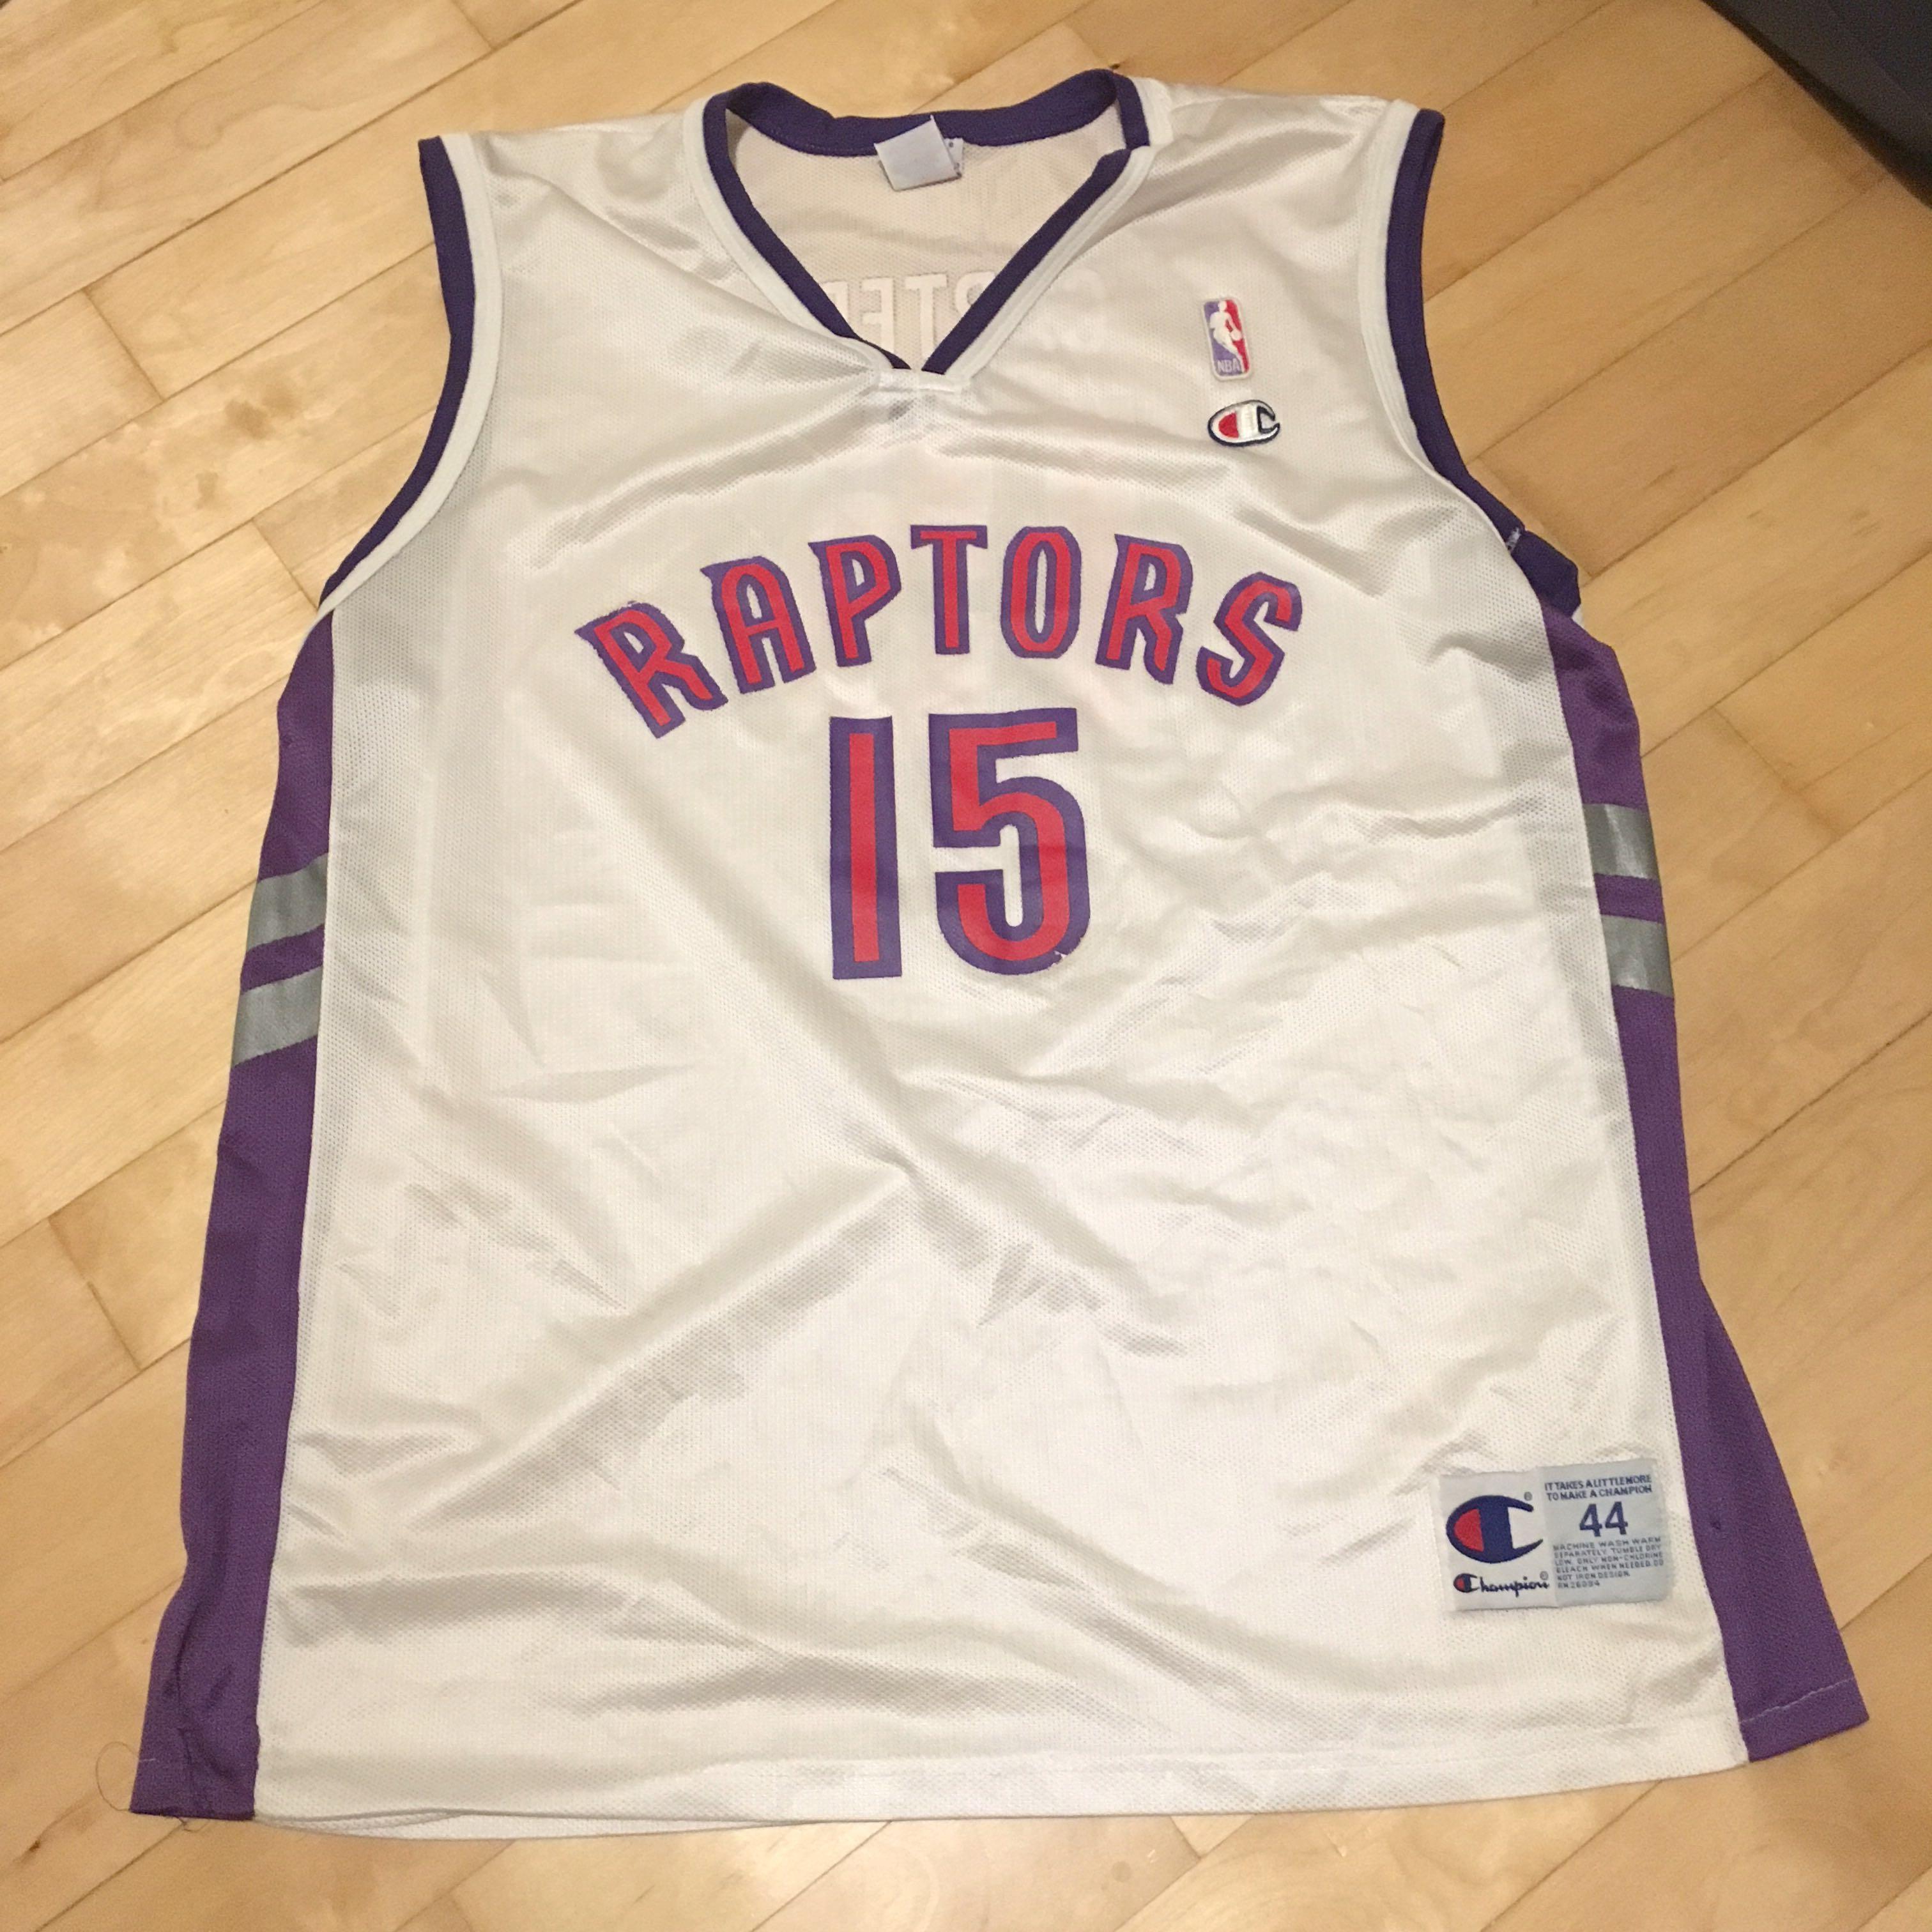 reputable site be900 af4ac Authentic Champion NBA Vince Carter Toronto Raptors Jersey ...